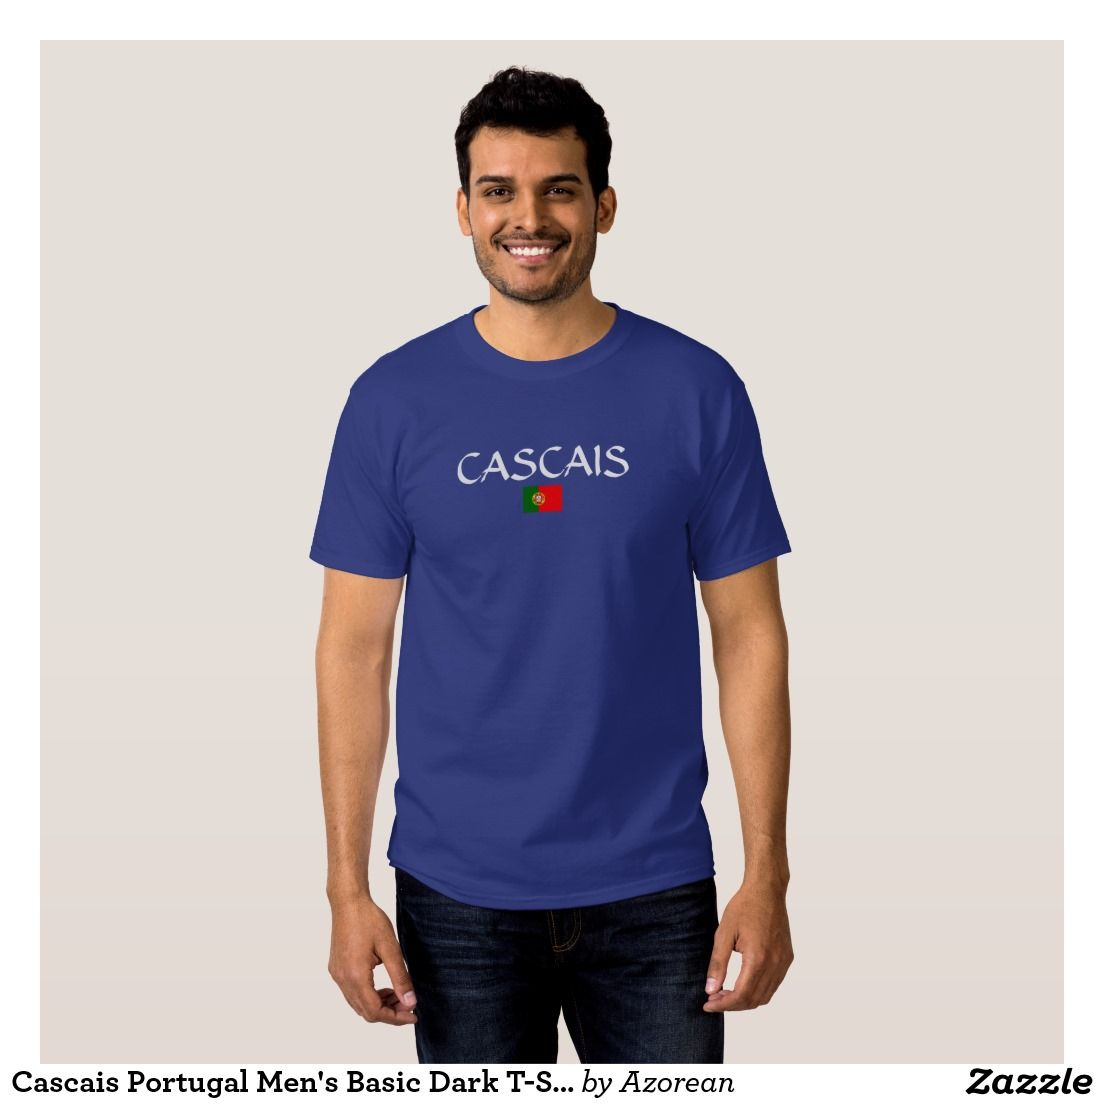 b5d9e335 Cascais Portugal Men's Basic Dark T-Shirt   Zazzle.com   Portuguese ...